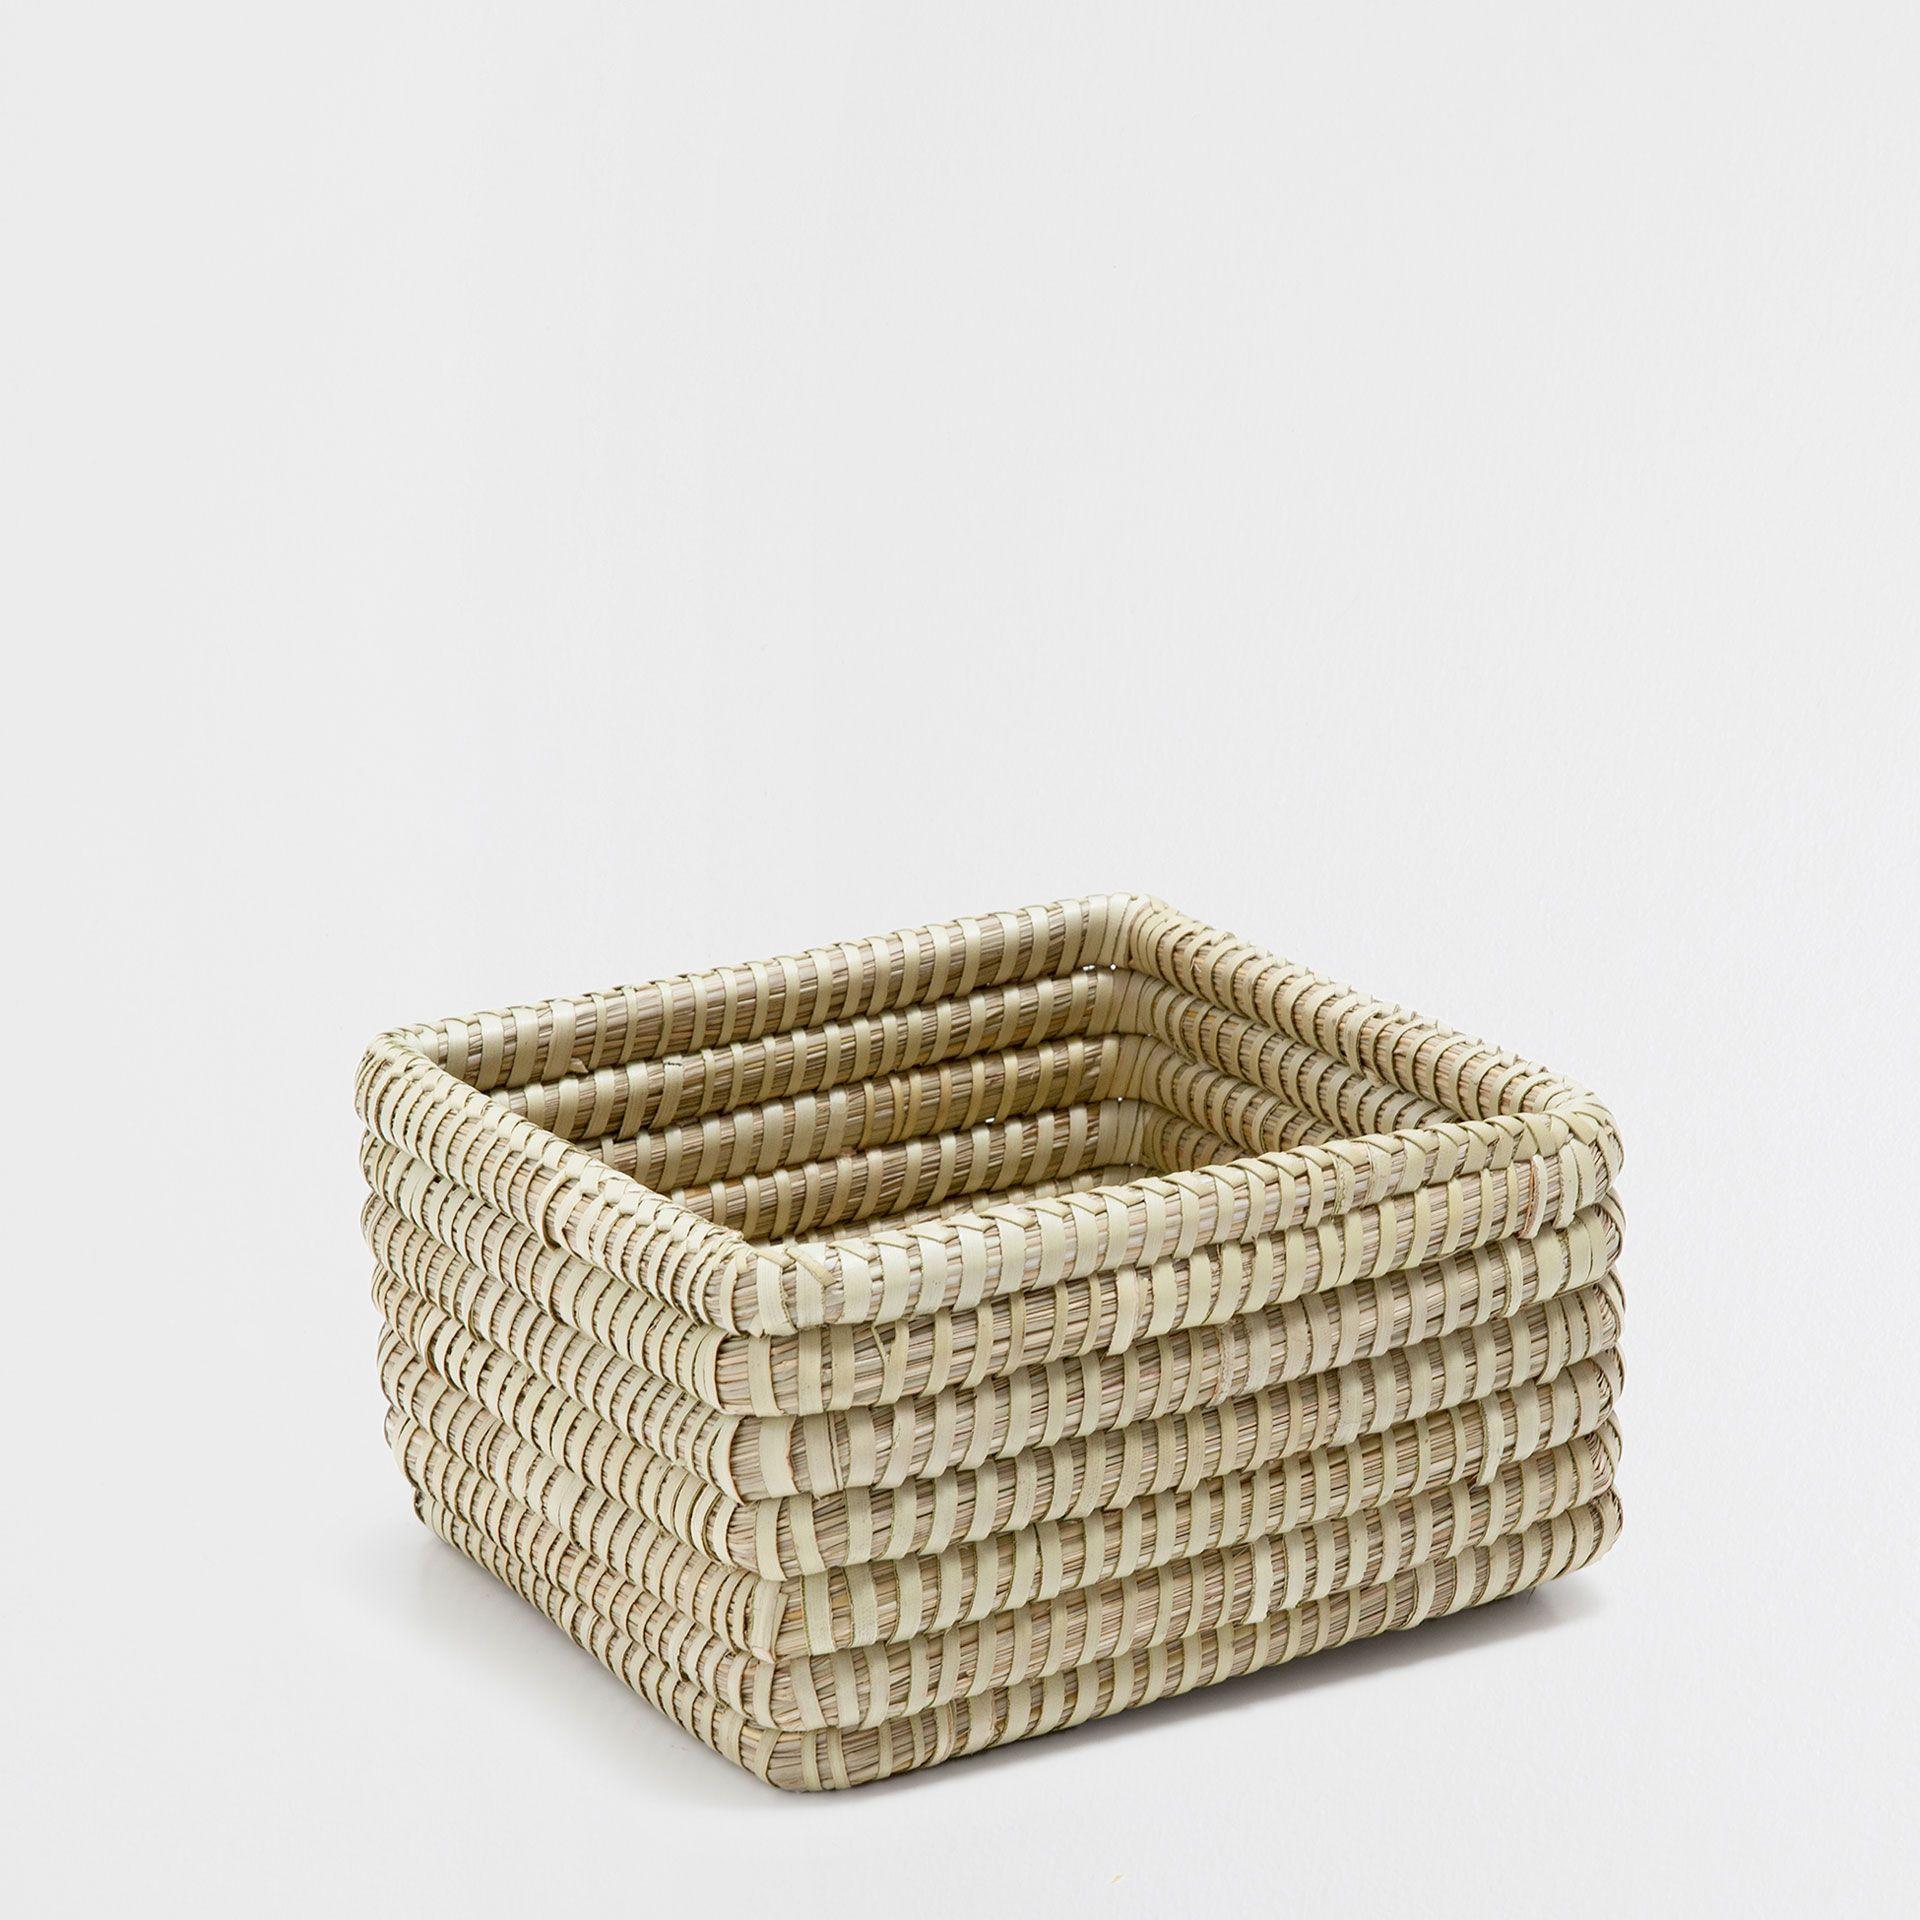 Rechteckiger Naturfarbener Korb Korbe Dekoration Zara Home